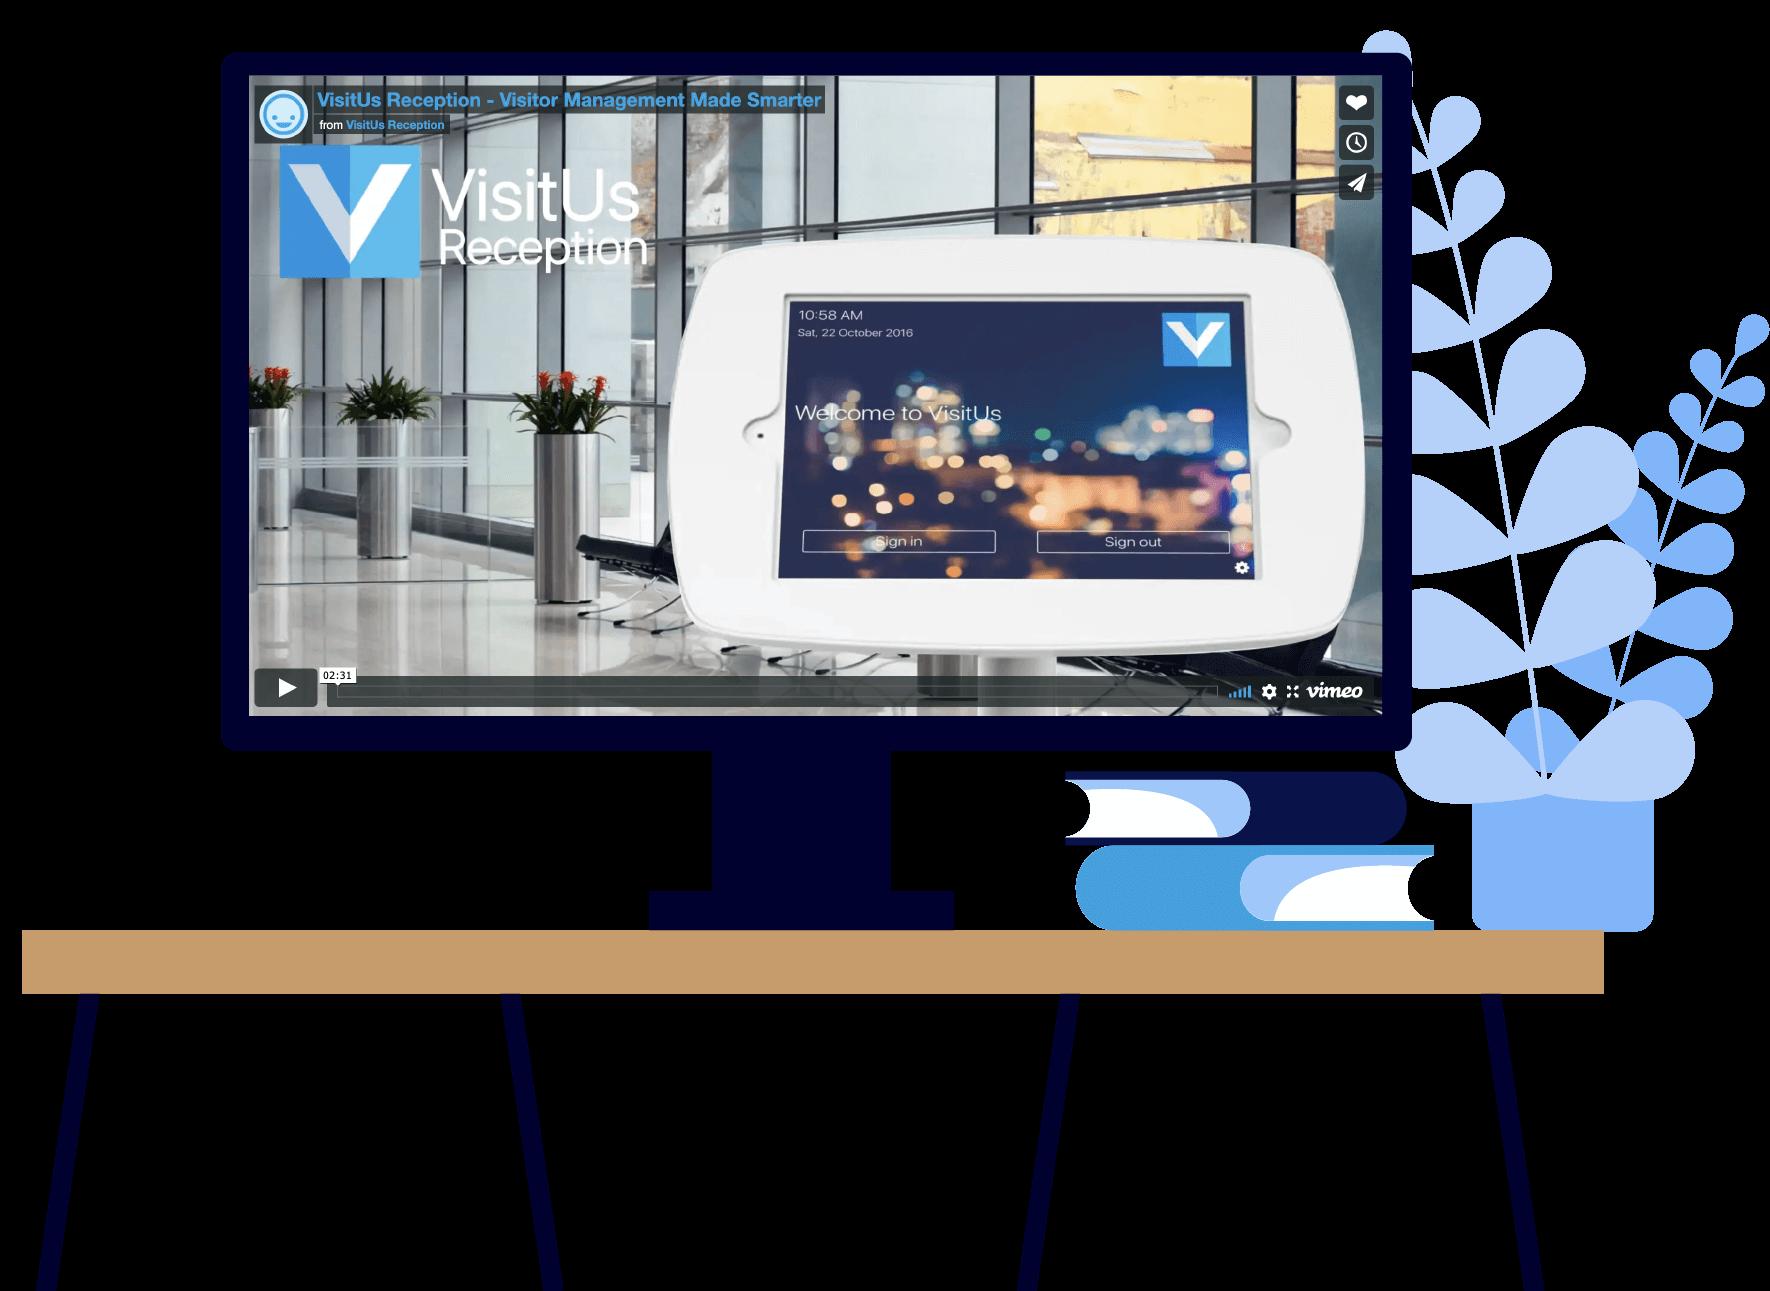 Visit Us Reception Video